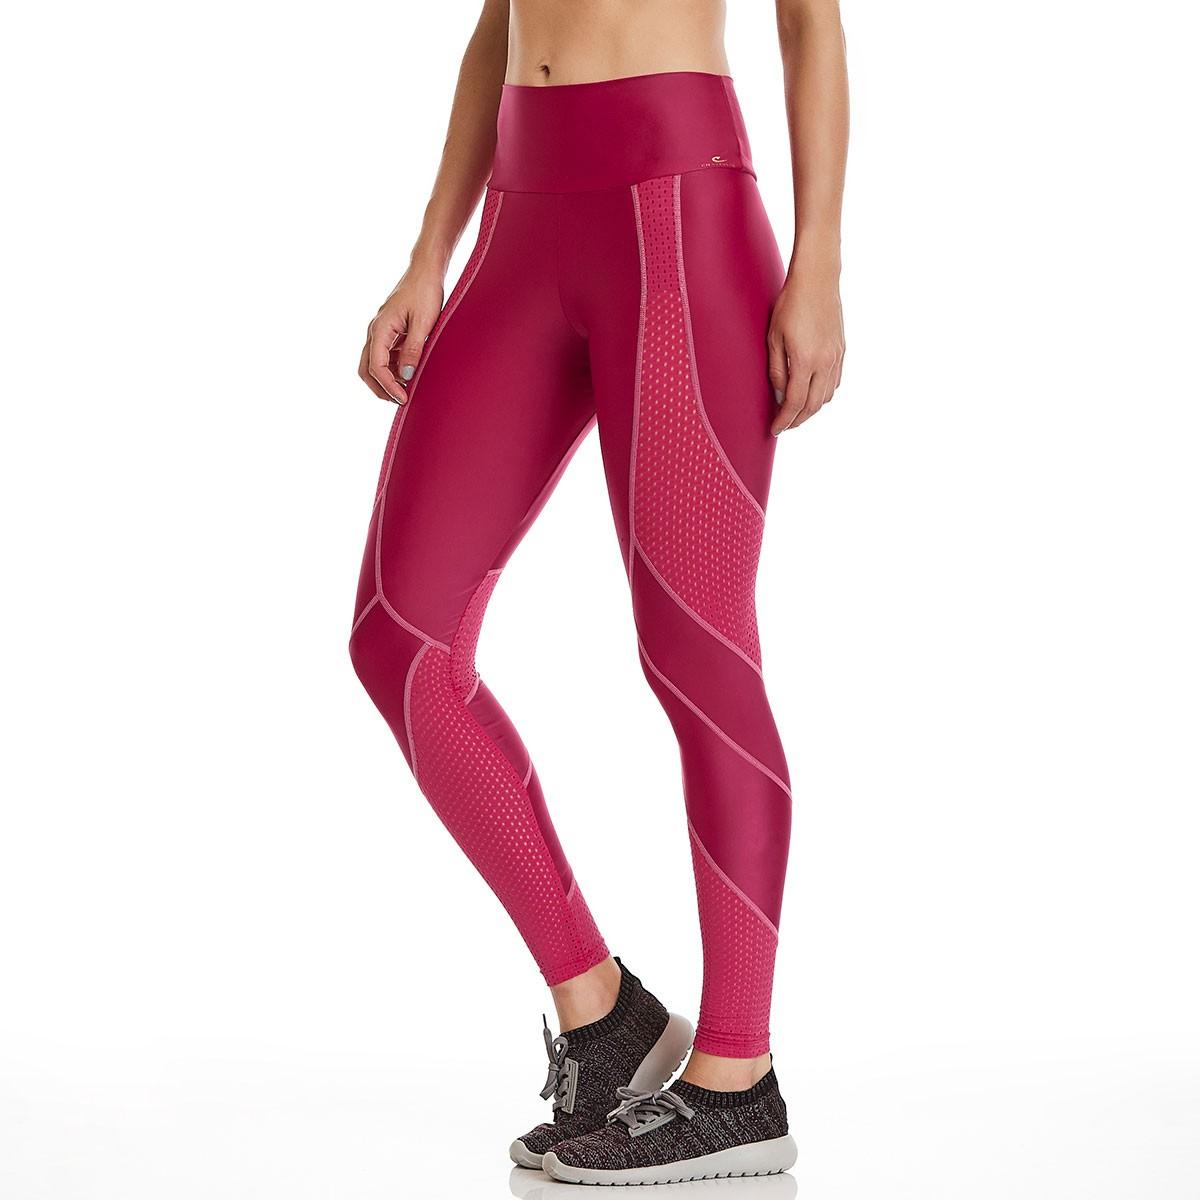 Legging Action Rosa CAJUBRASIL Activewear